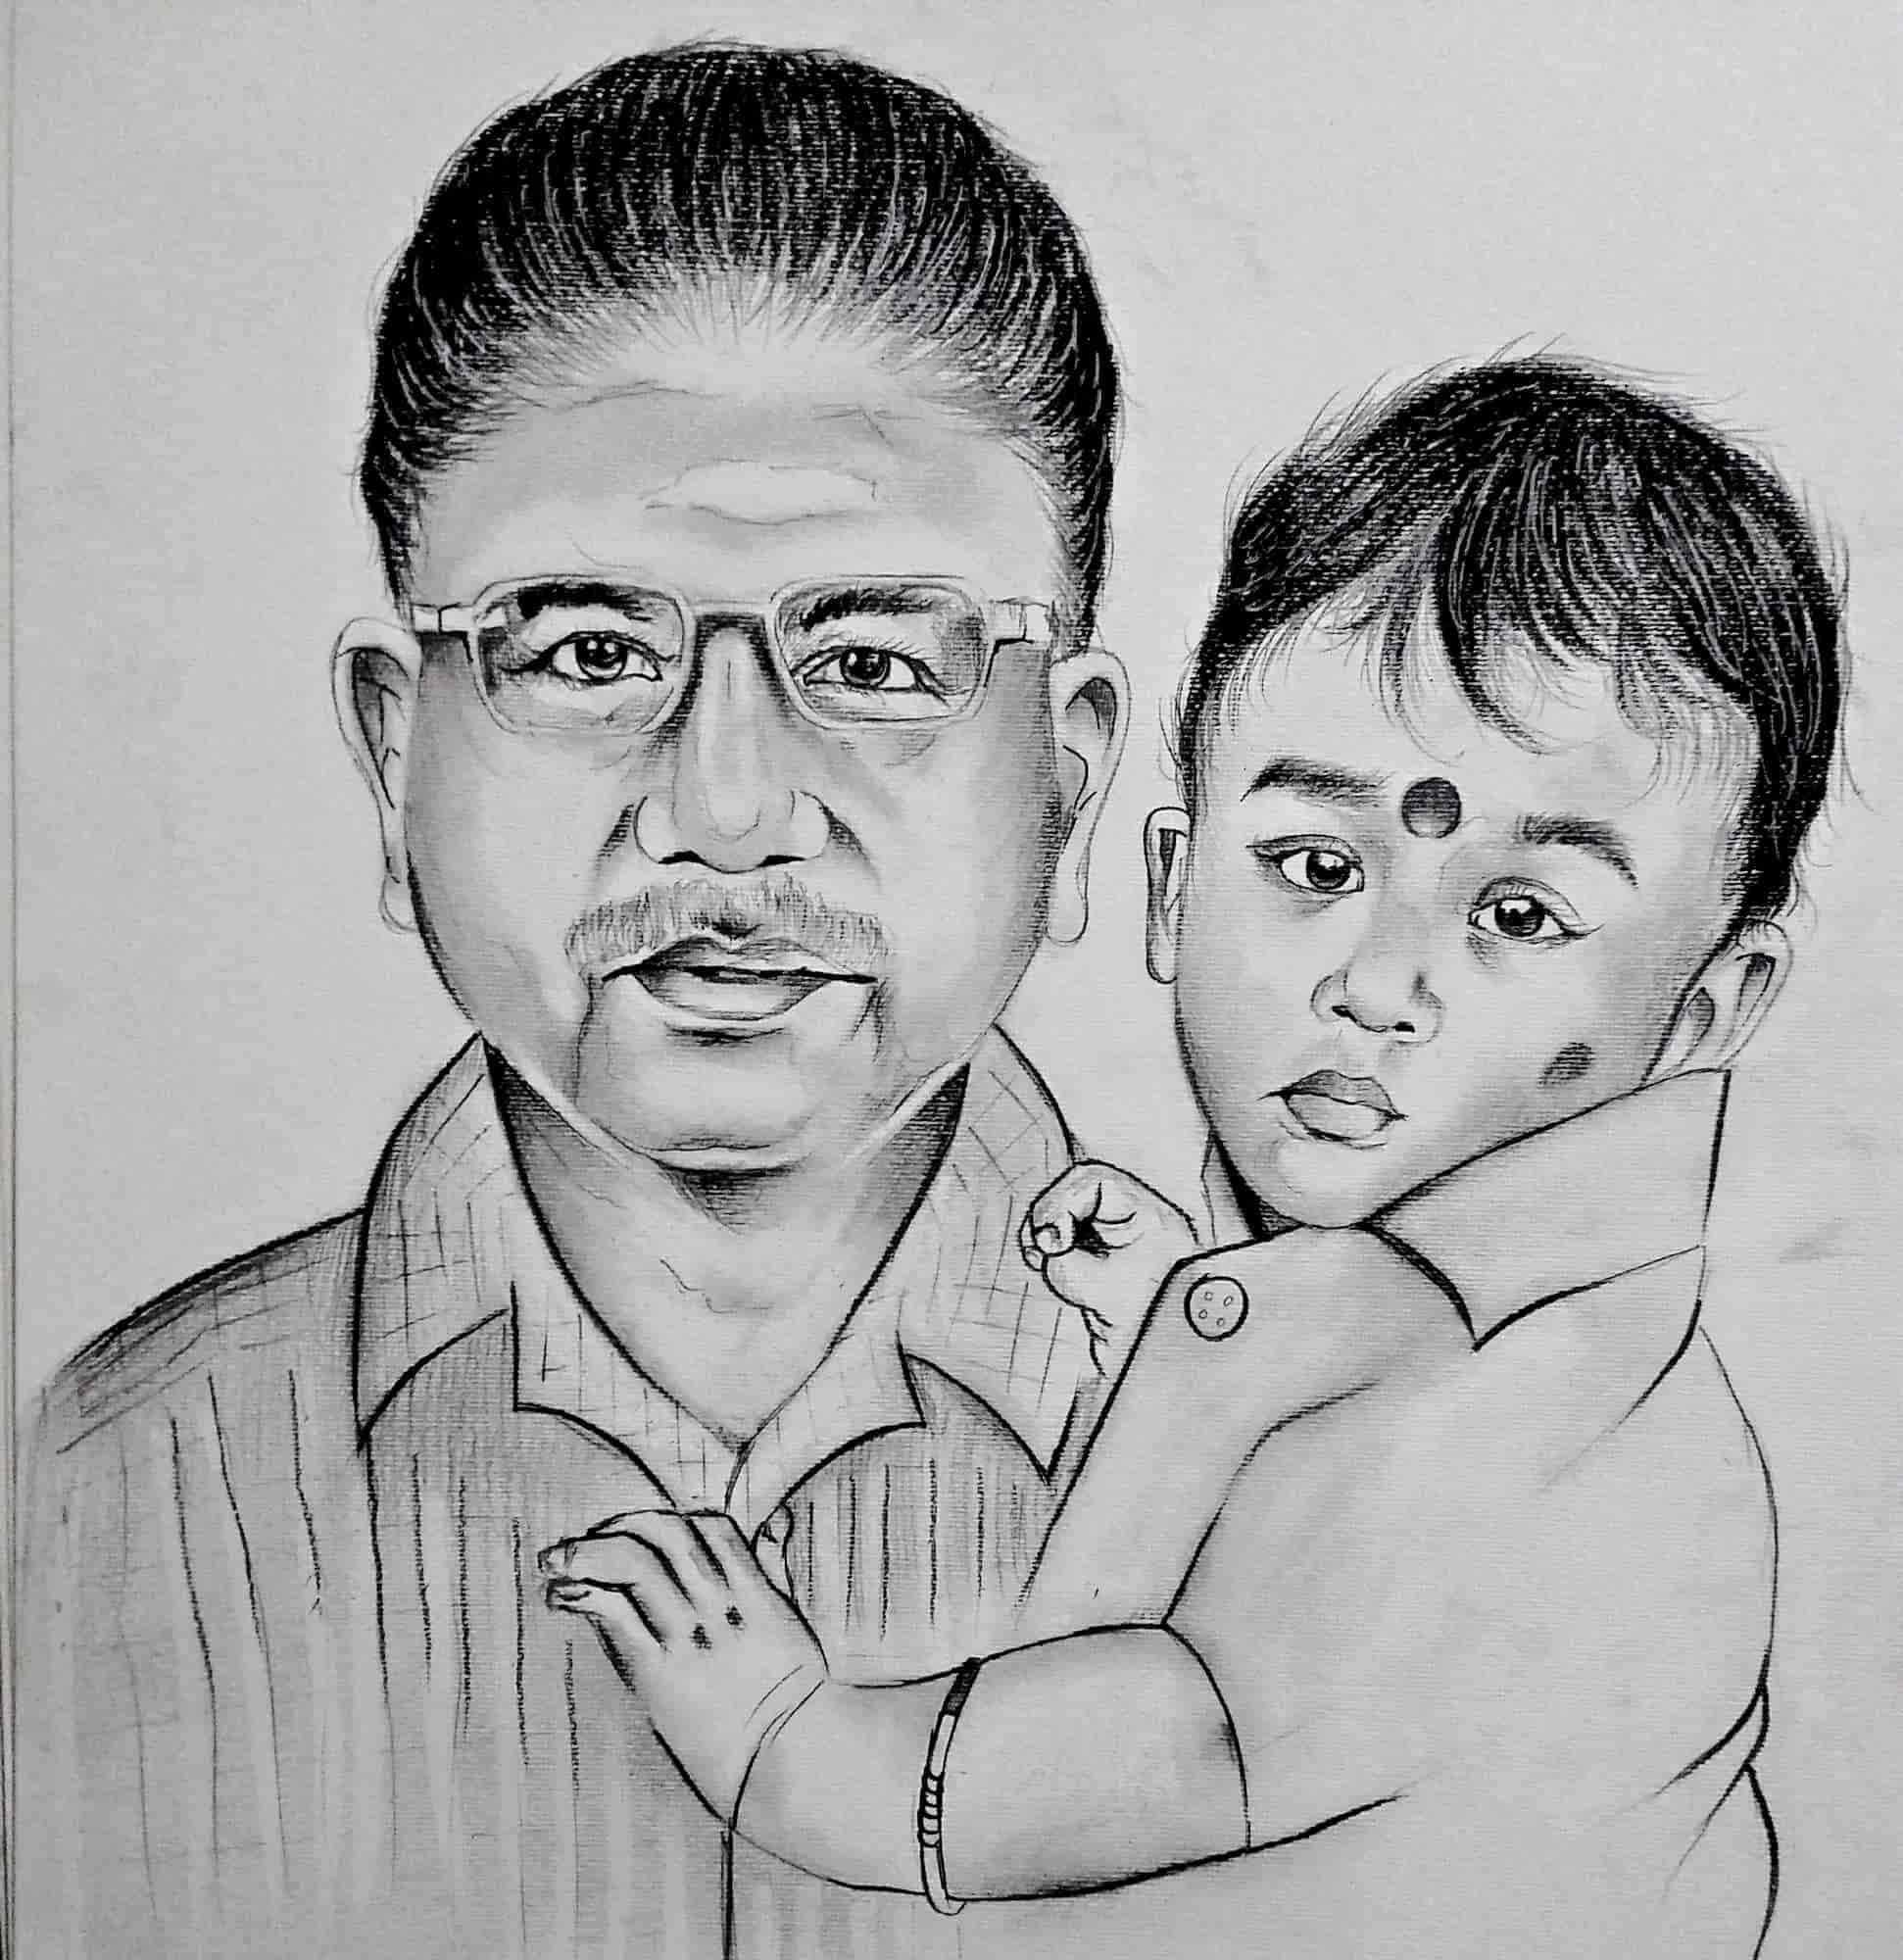 Pencil sketch sasis art studio photos ashok nagar chennai drawing job work